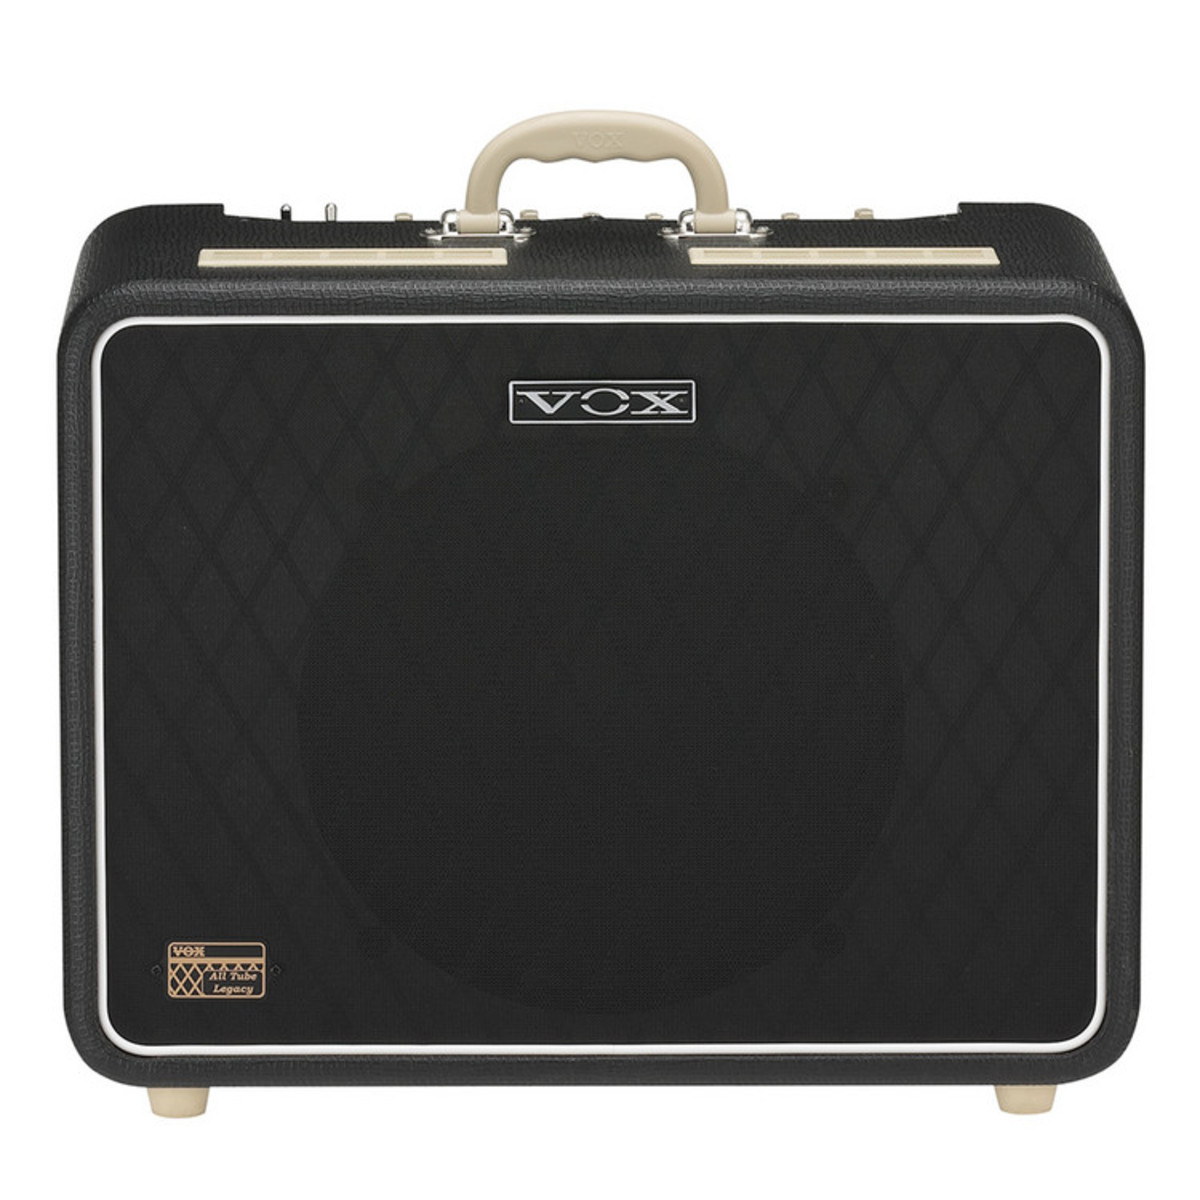 vox nt15c1 night train 15w guitar combo amp at. Black Bedroom Furniture Sets. Home Design Ideas